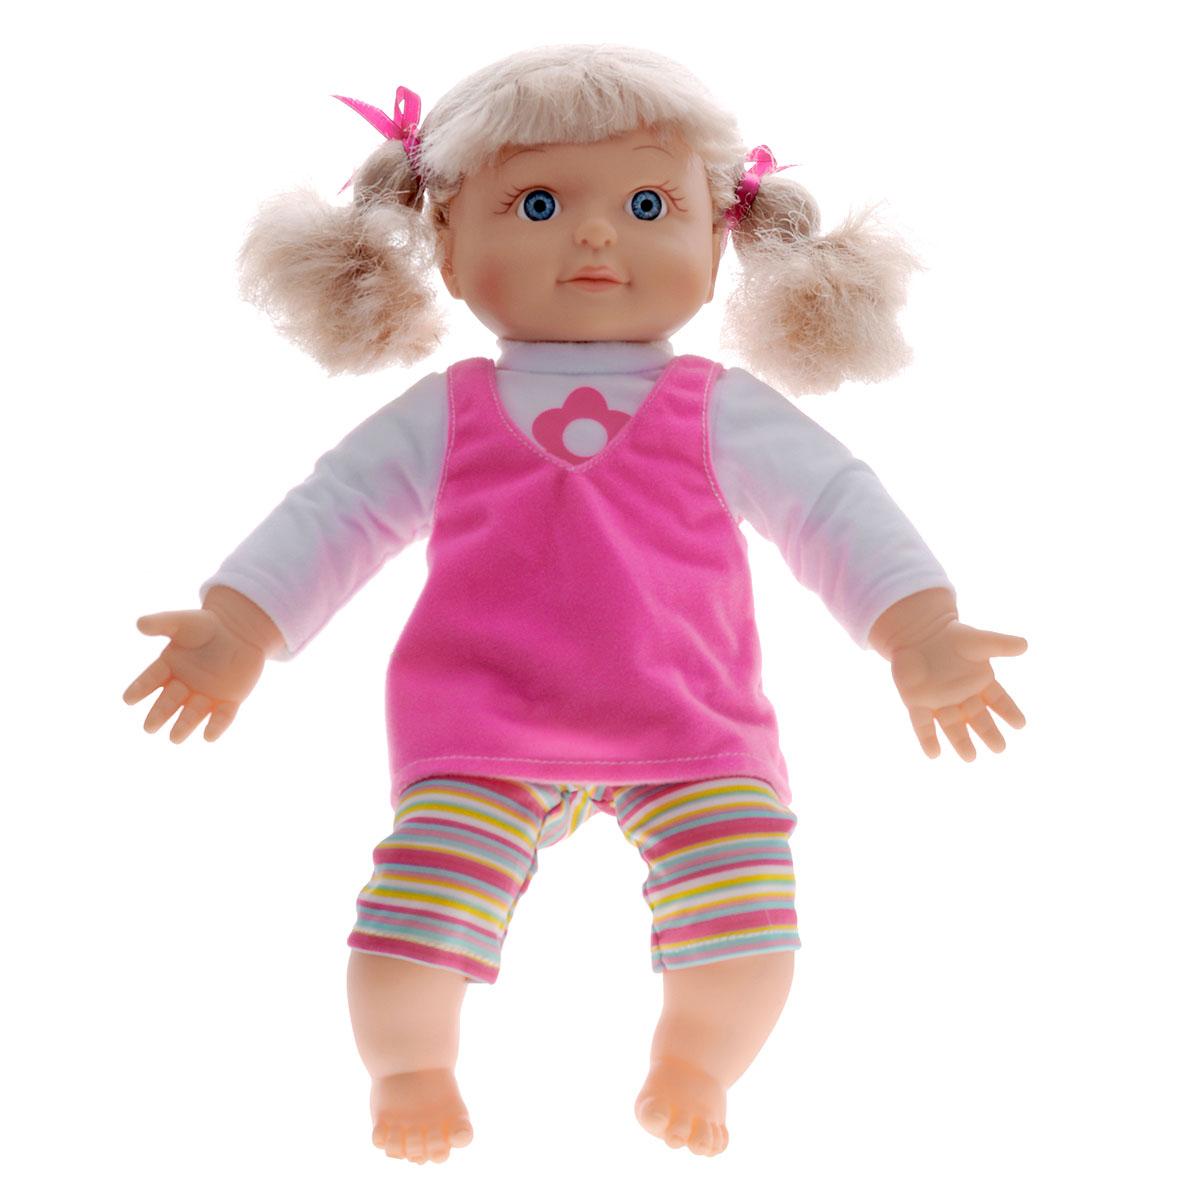 Mary Poppins Интерактивная кукла Алена Я учу части тела, 38 см алена весная шанс